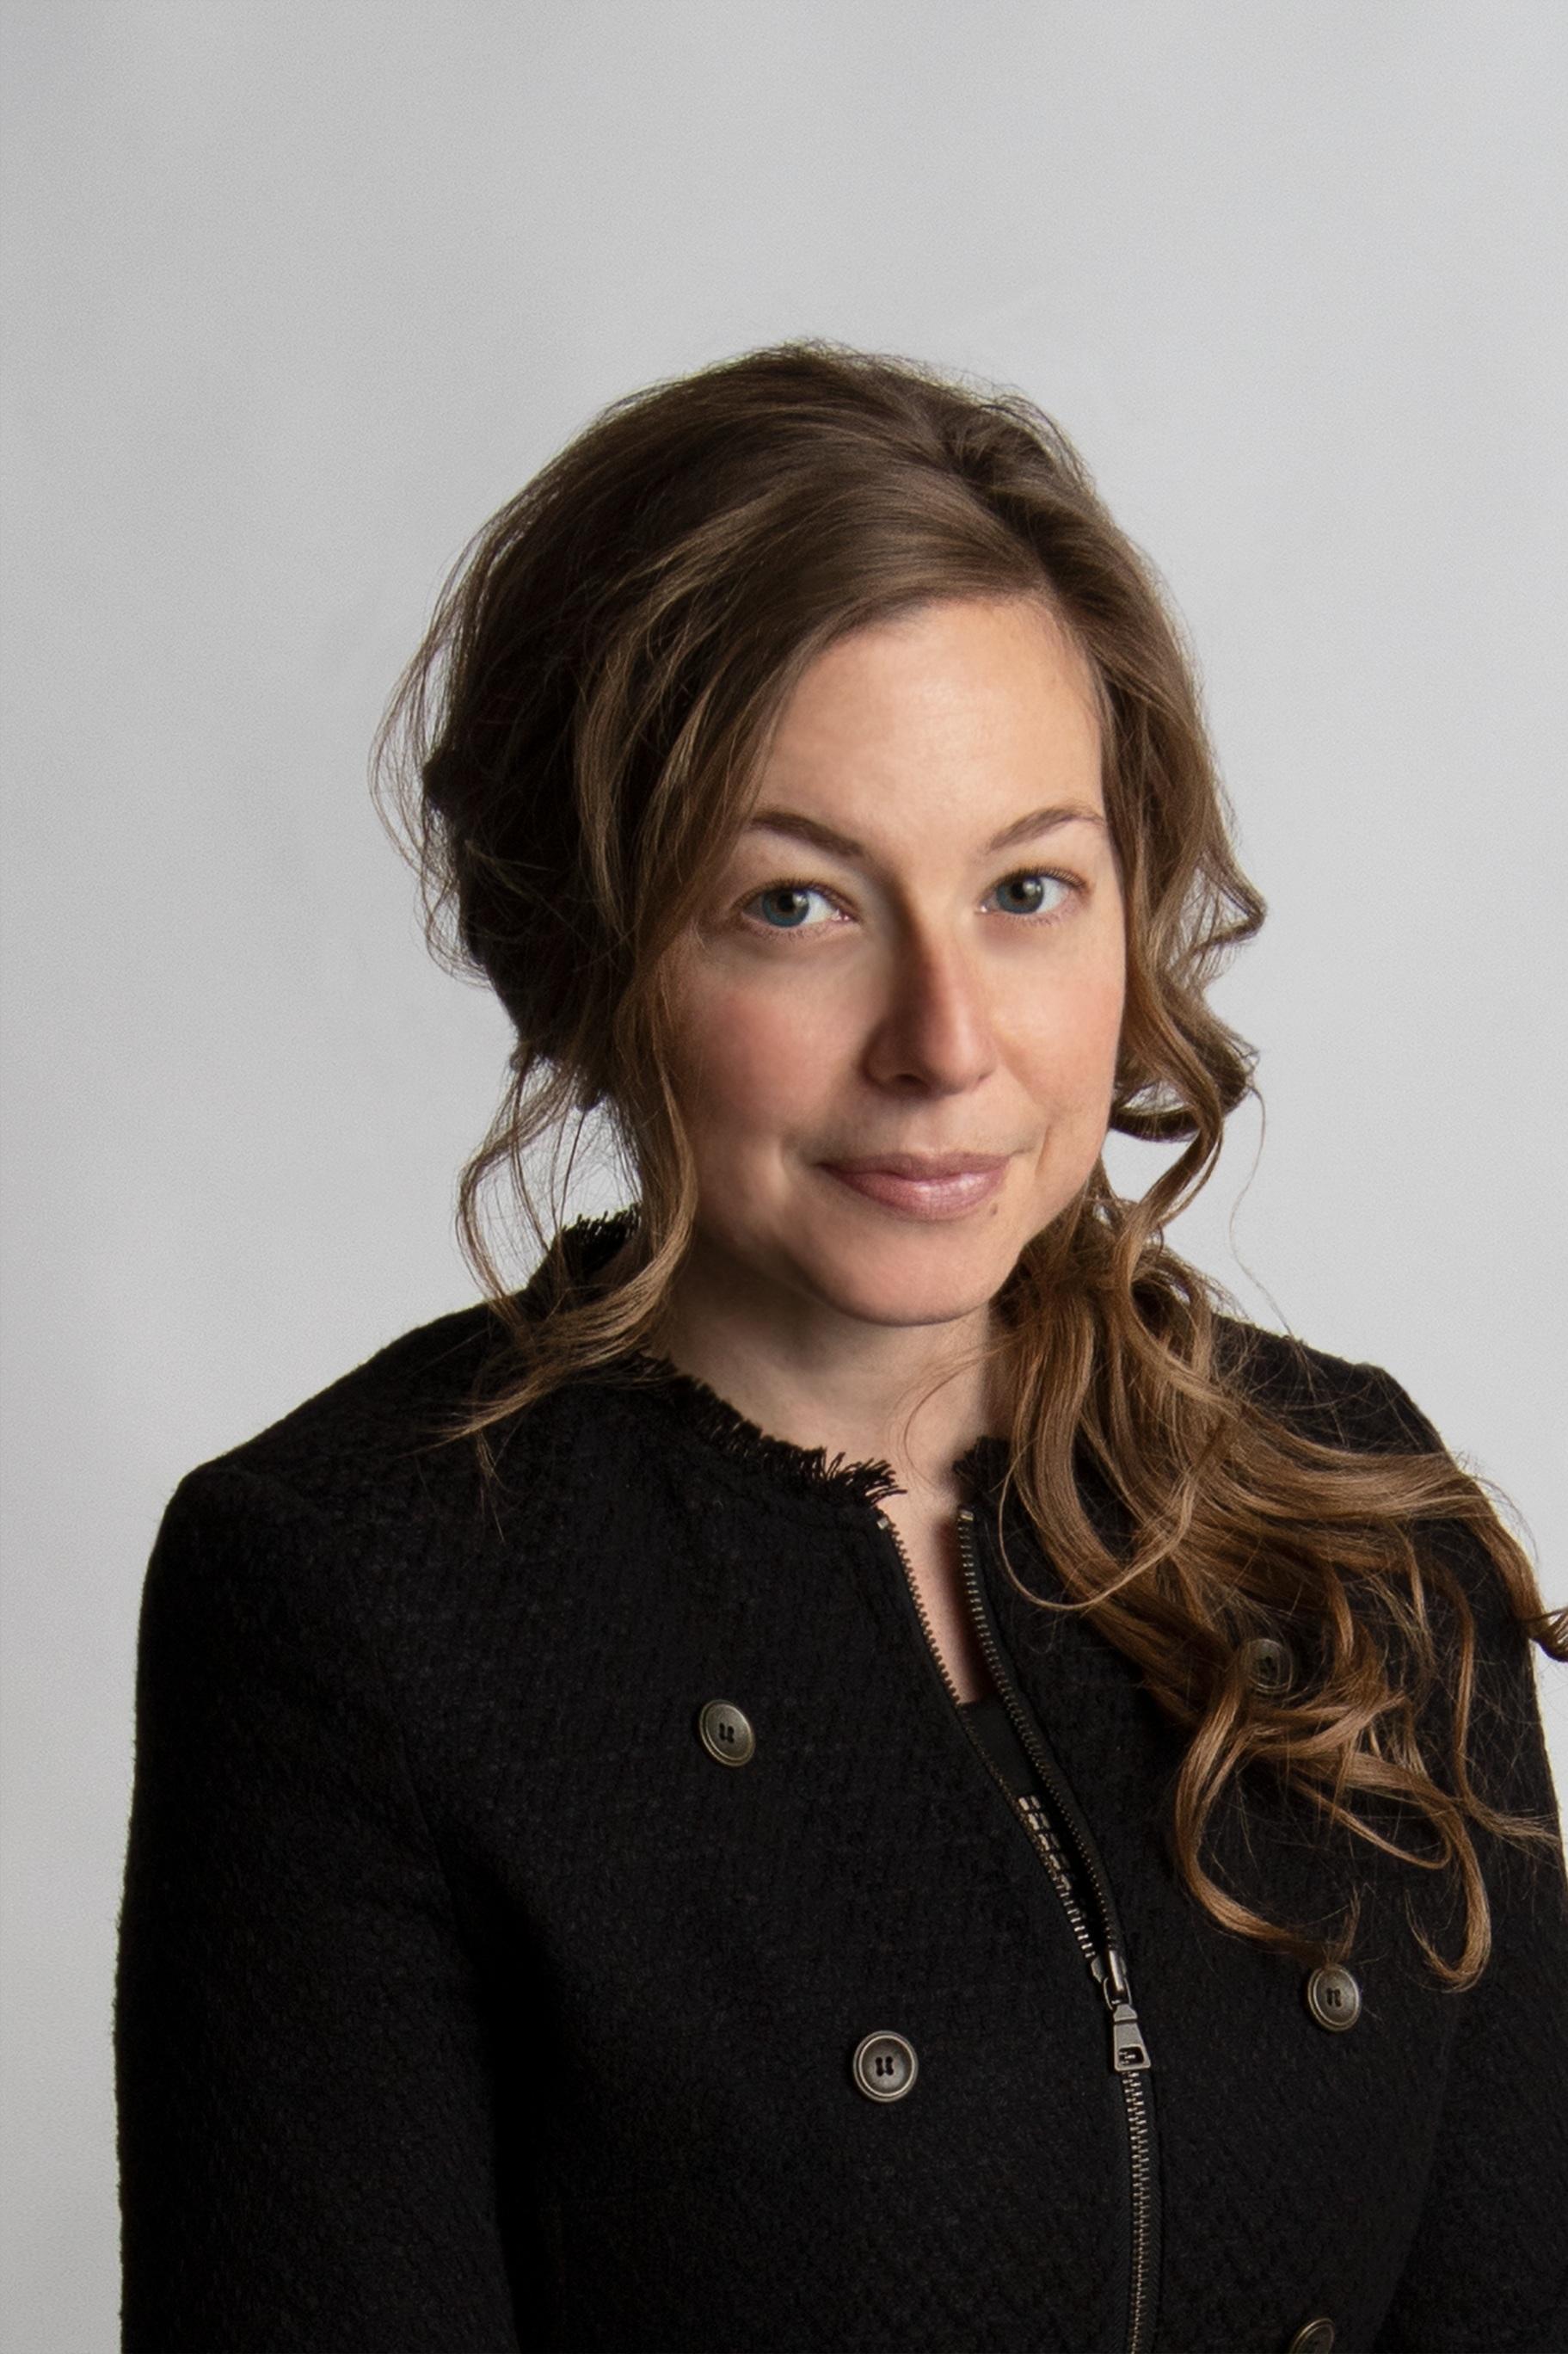 Jessica Kitchens